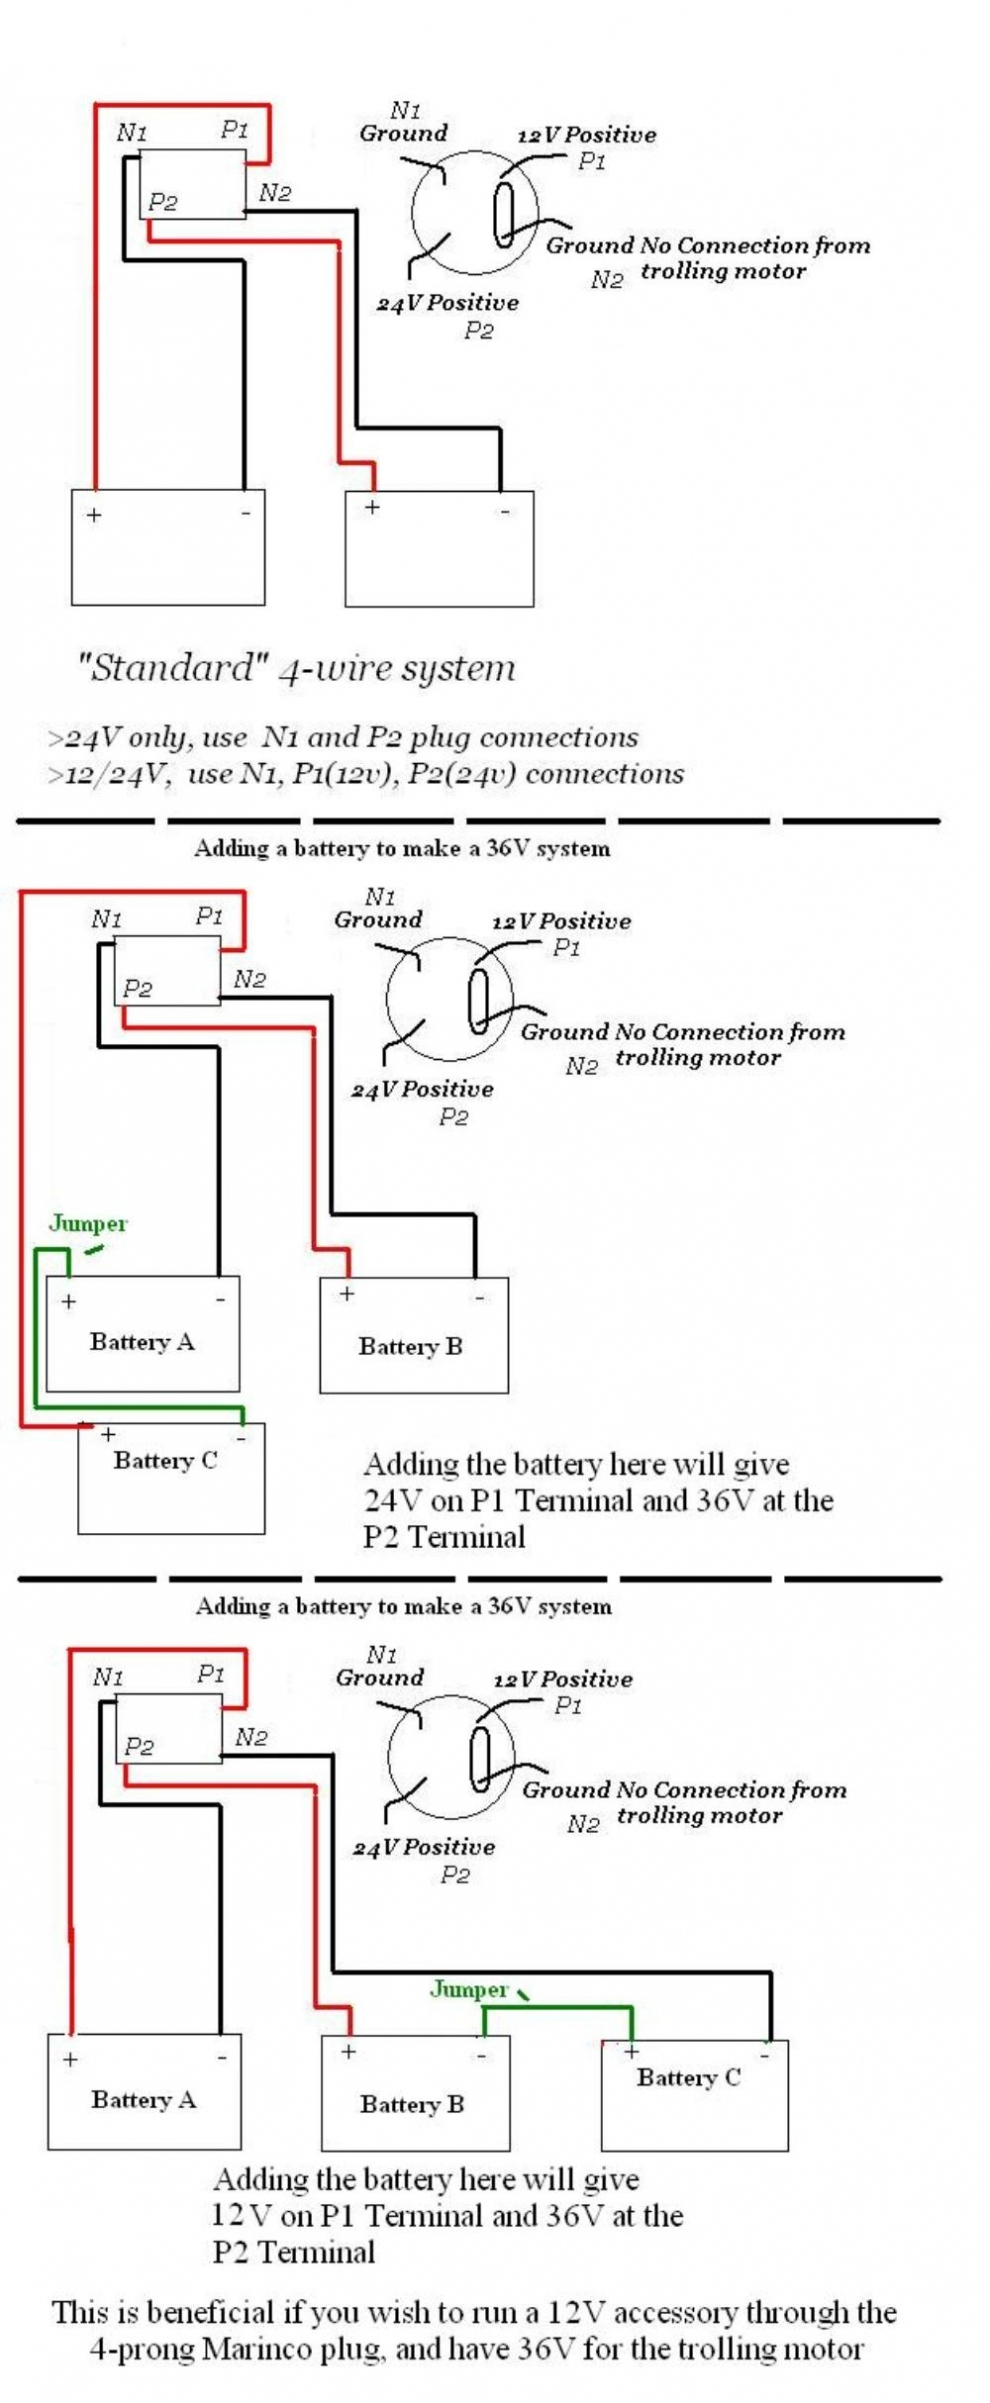 Trolling Motor Wiring Diagram 12 Volt Inspirationa Trolling Motor - 24 Volt Battery Wiring Diagram